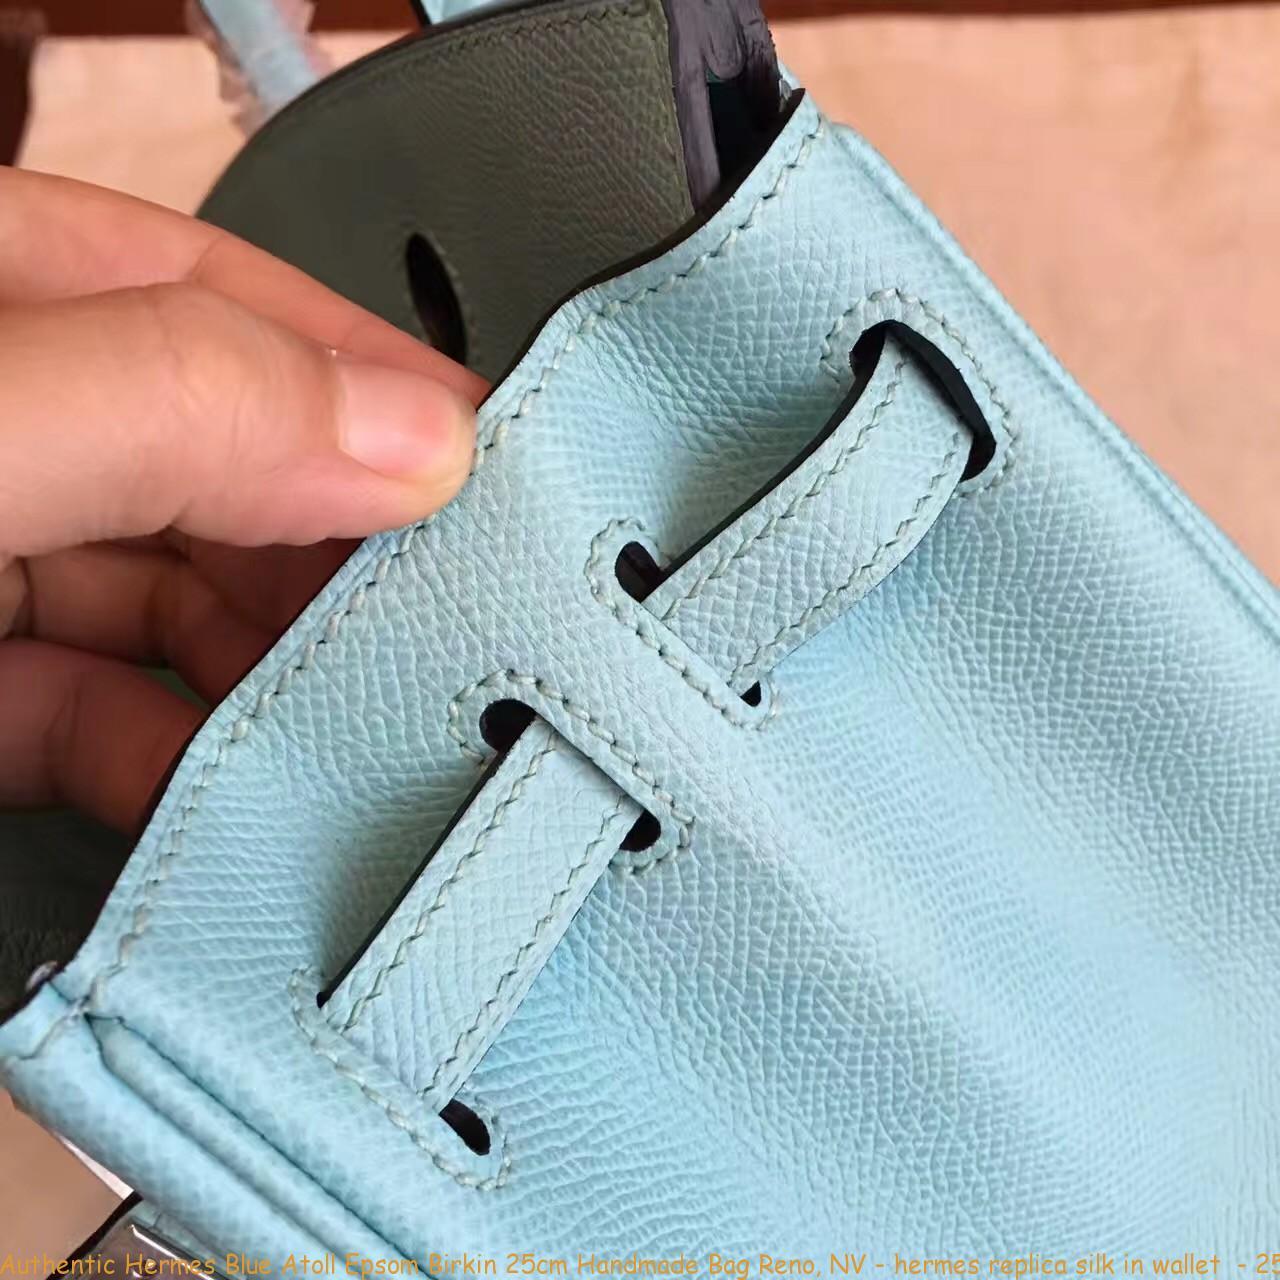 88ff9a679f0 Authentic Hermes Blue Atoll Epsom Birkin 25cm Handmade Bag Reno